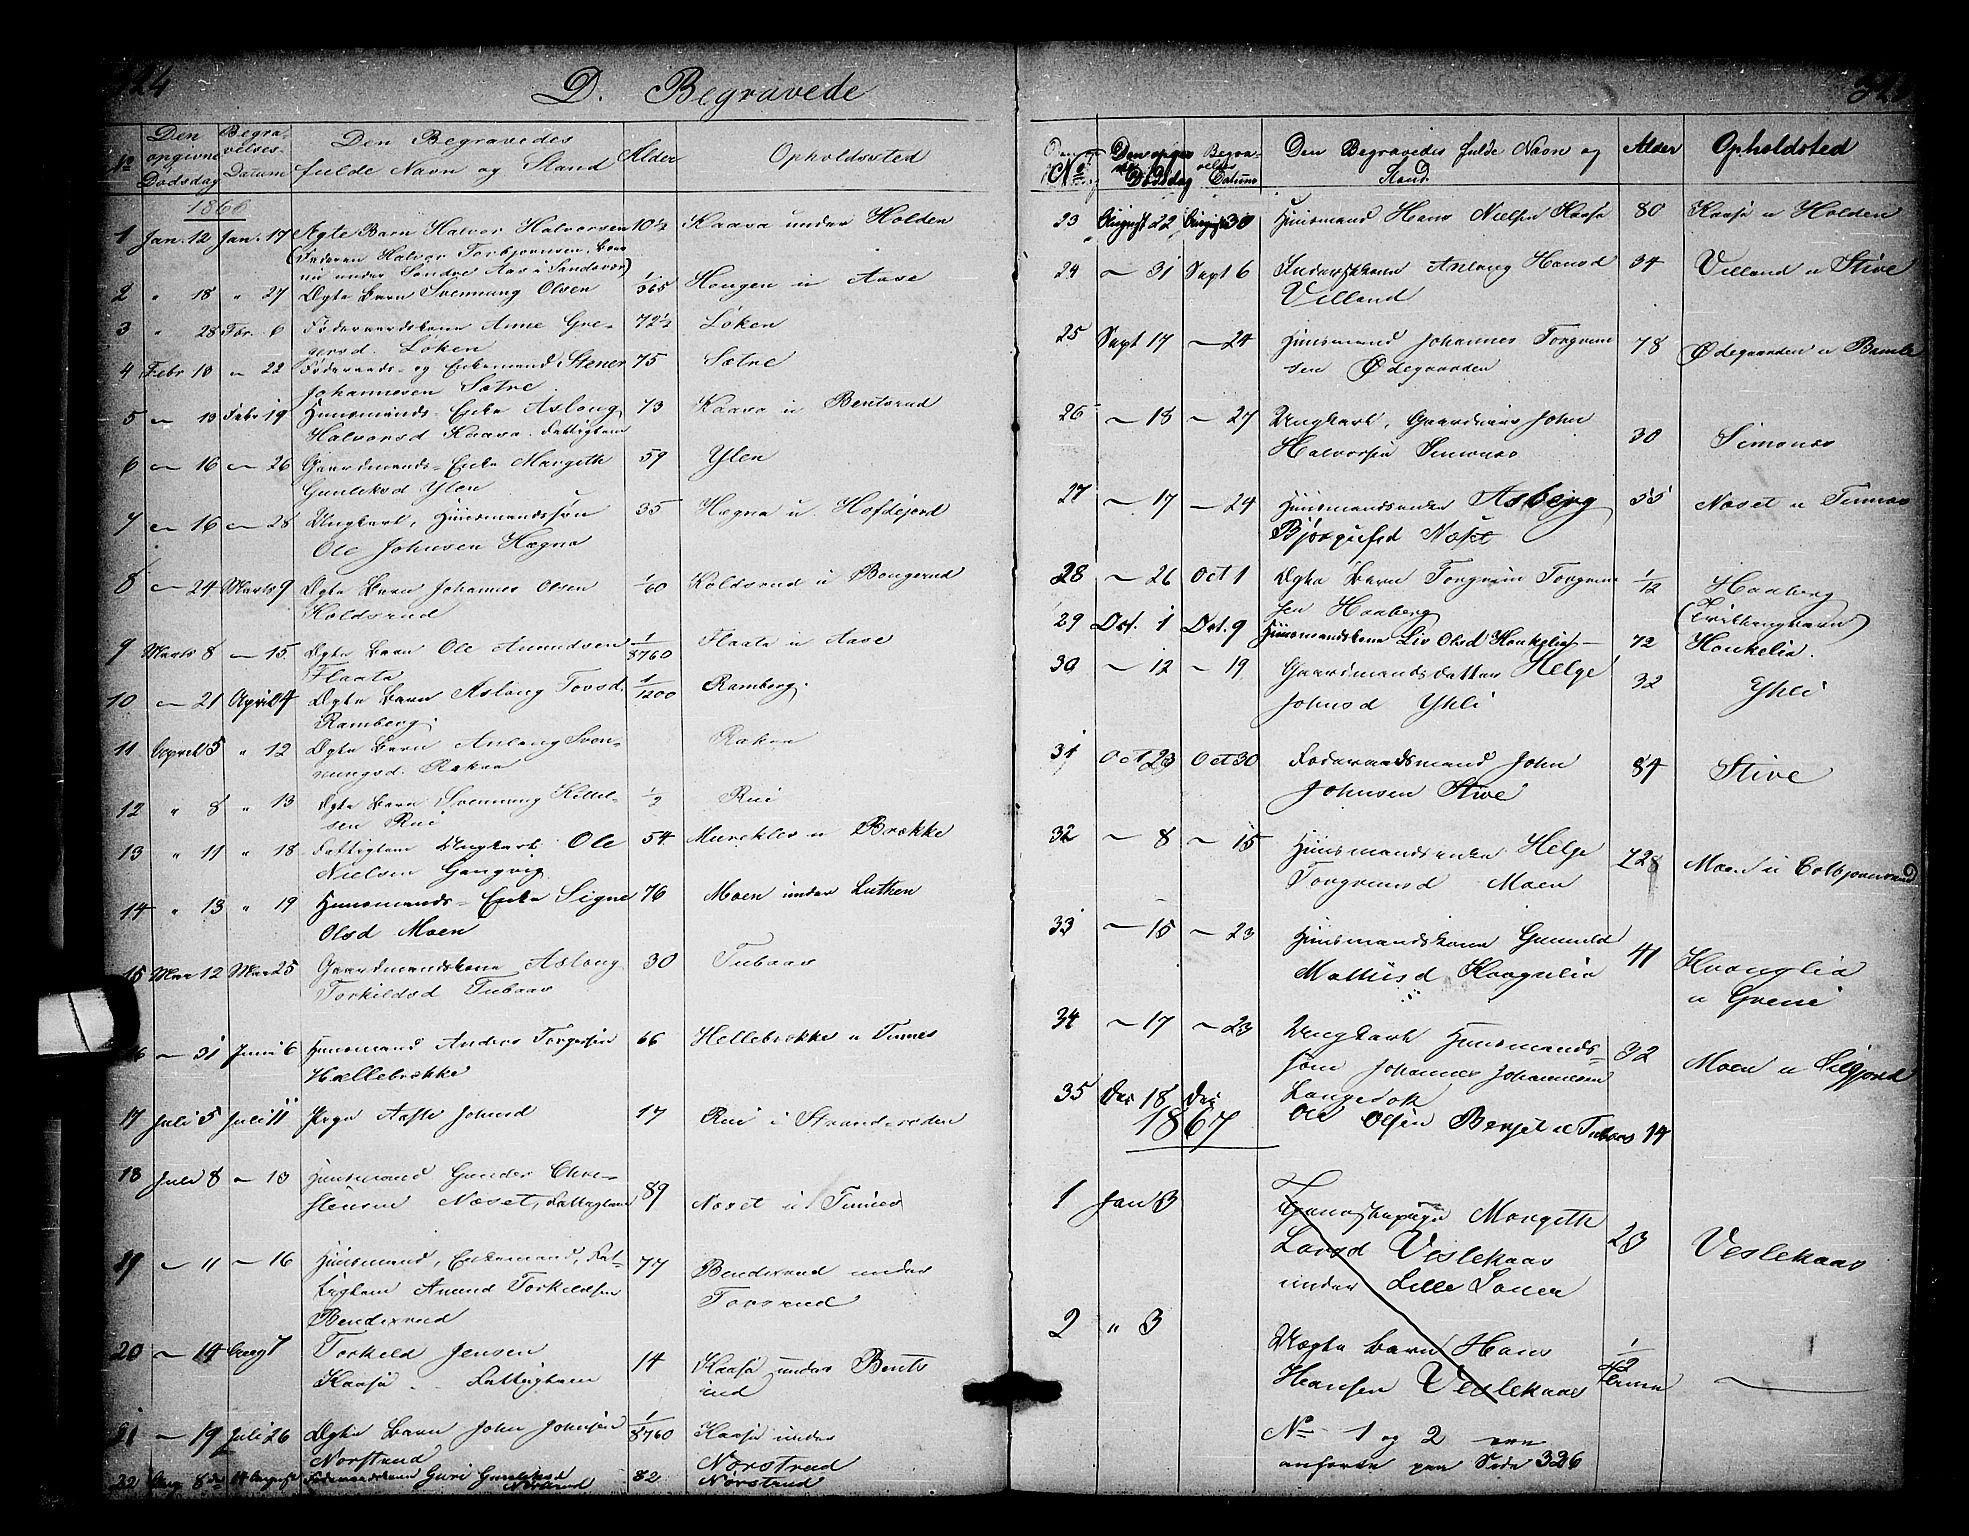 SAKO, Heddal kirkebøker, G/Ga/L0001: Klokkerbok nr. I 1, 1866-1878, s. 324-325